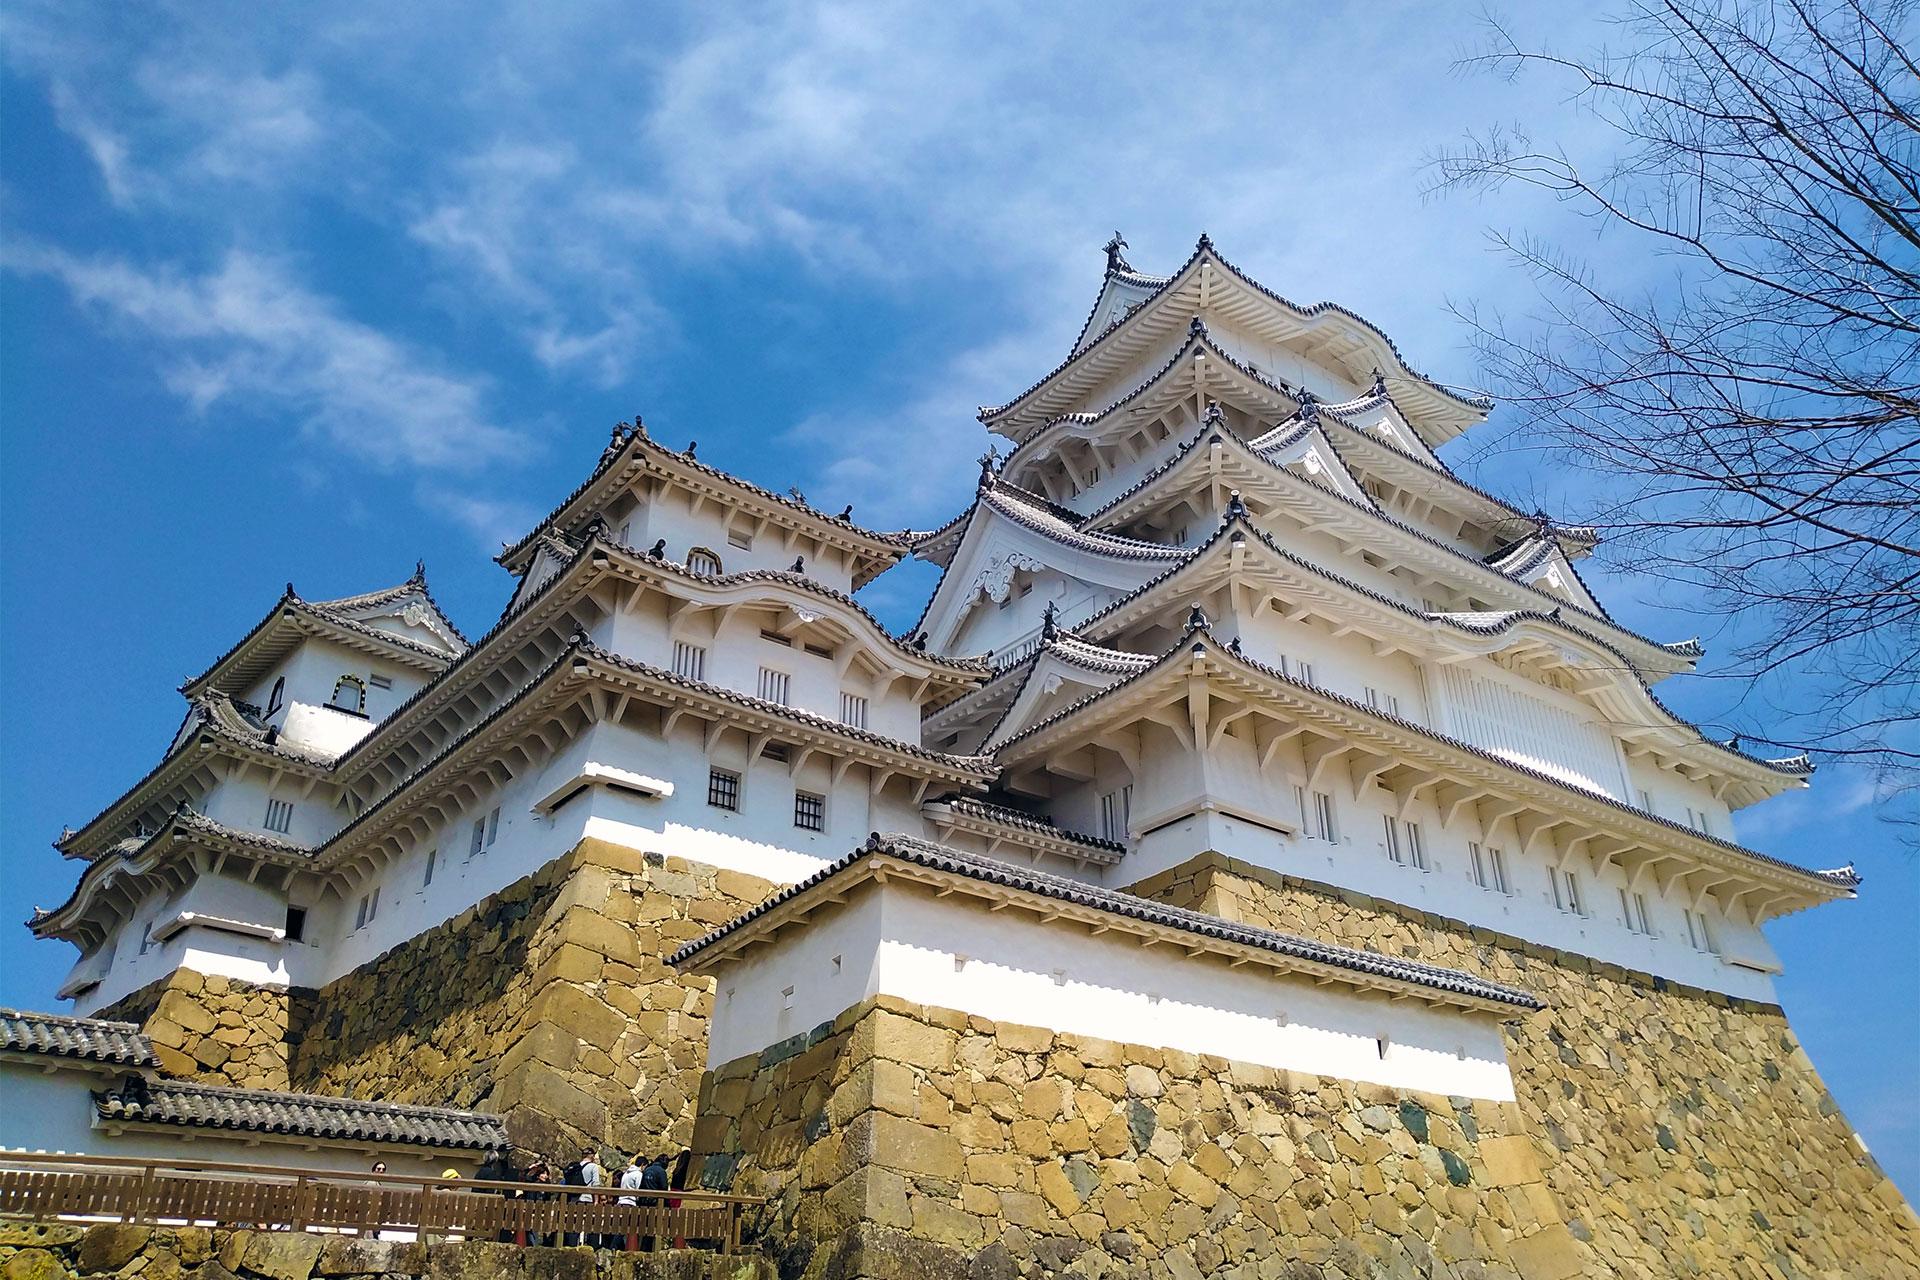 Castelul Himeji